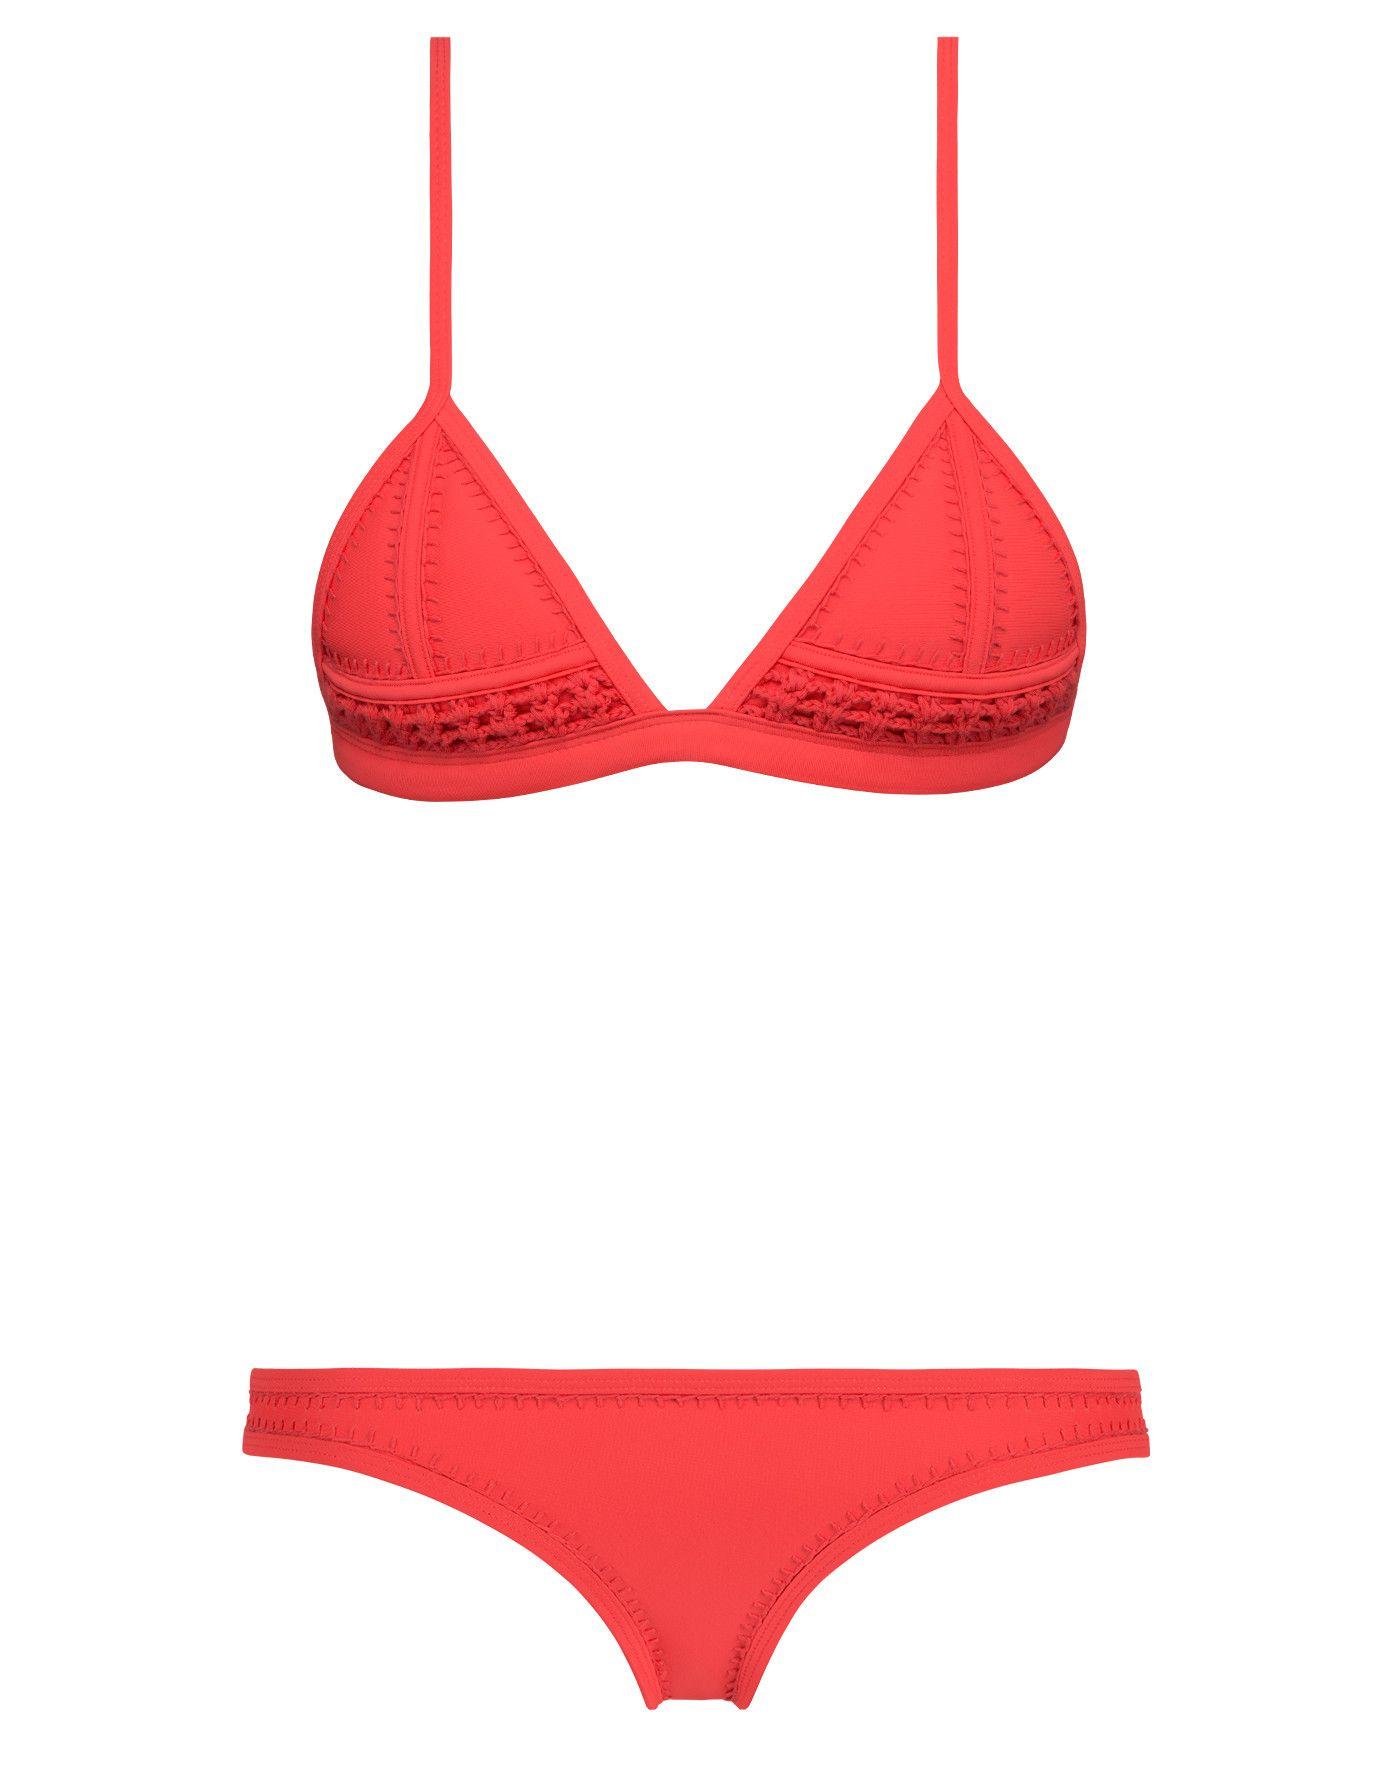 339a698afa GIGI - RED VELVET - TOP Red Triangle Bikini, Red Bikini, Bikini Triangl,